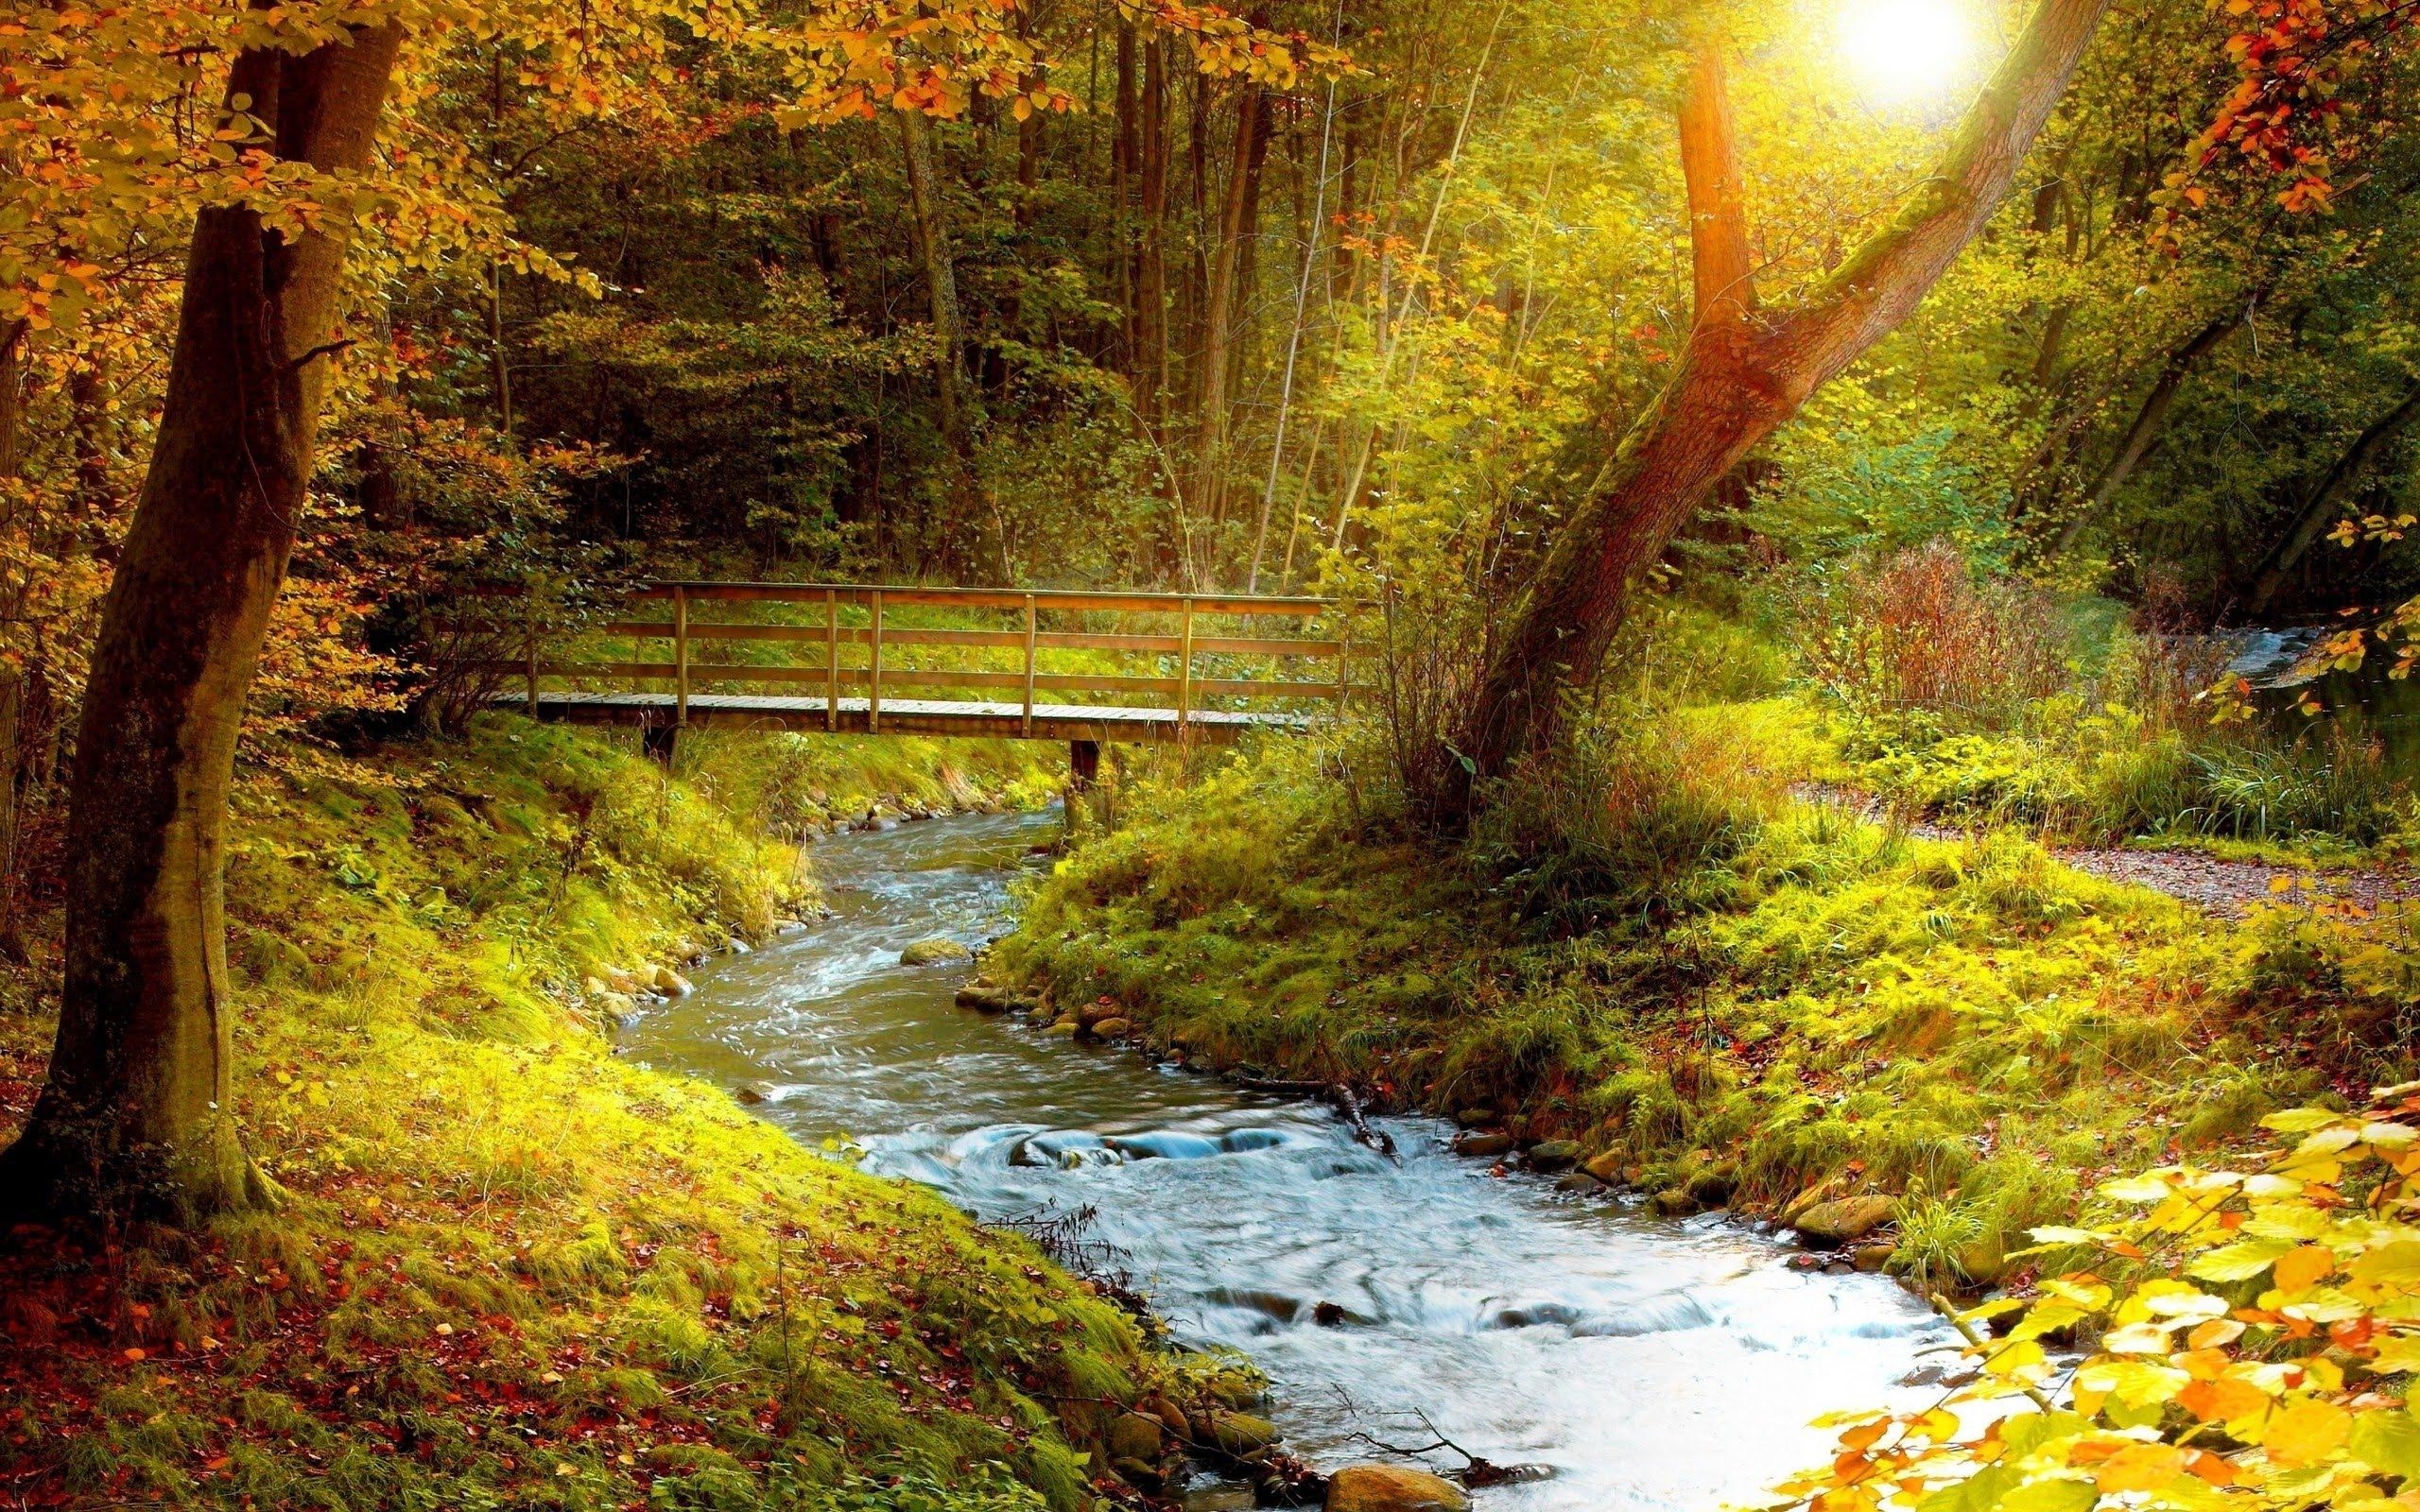 forest-stream-path.jpg